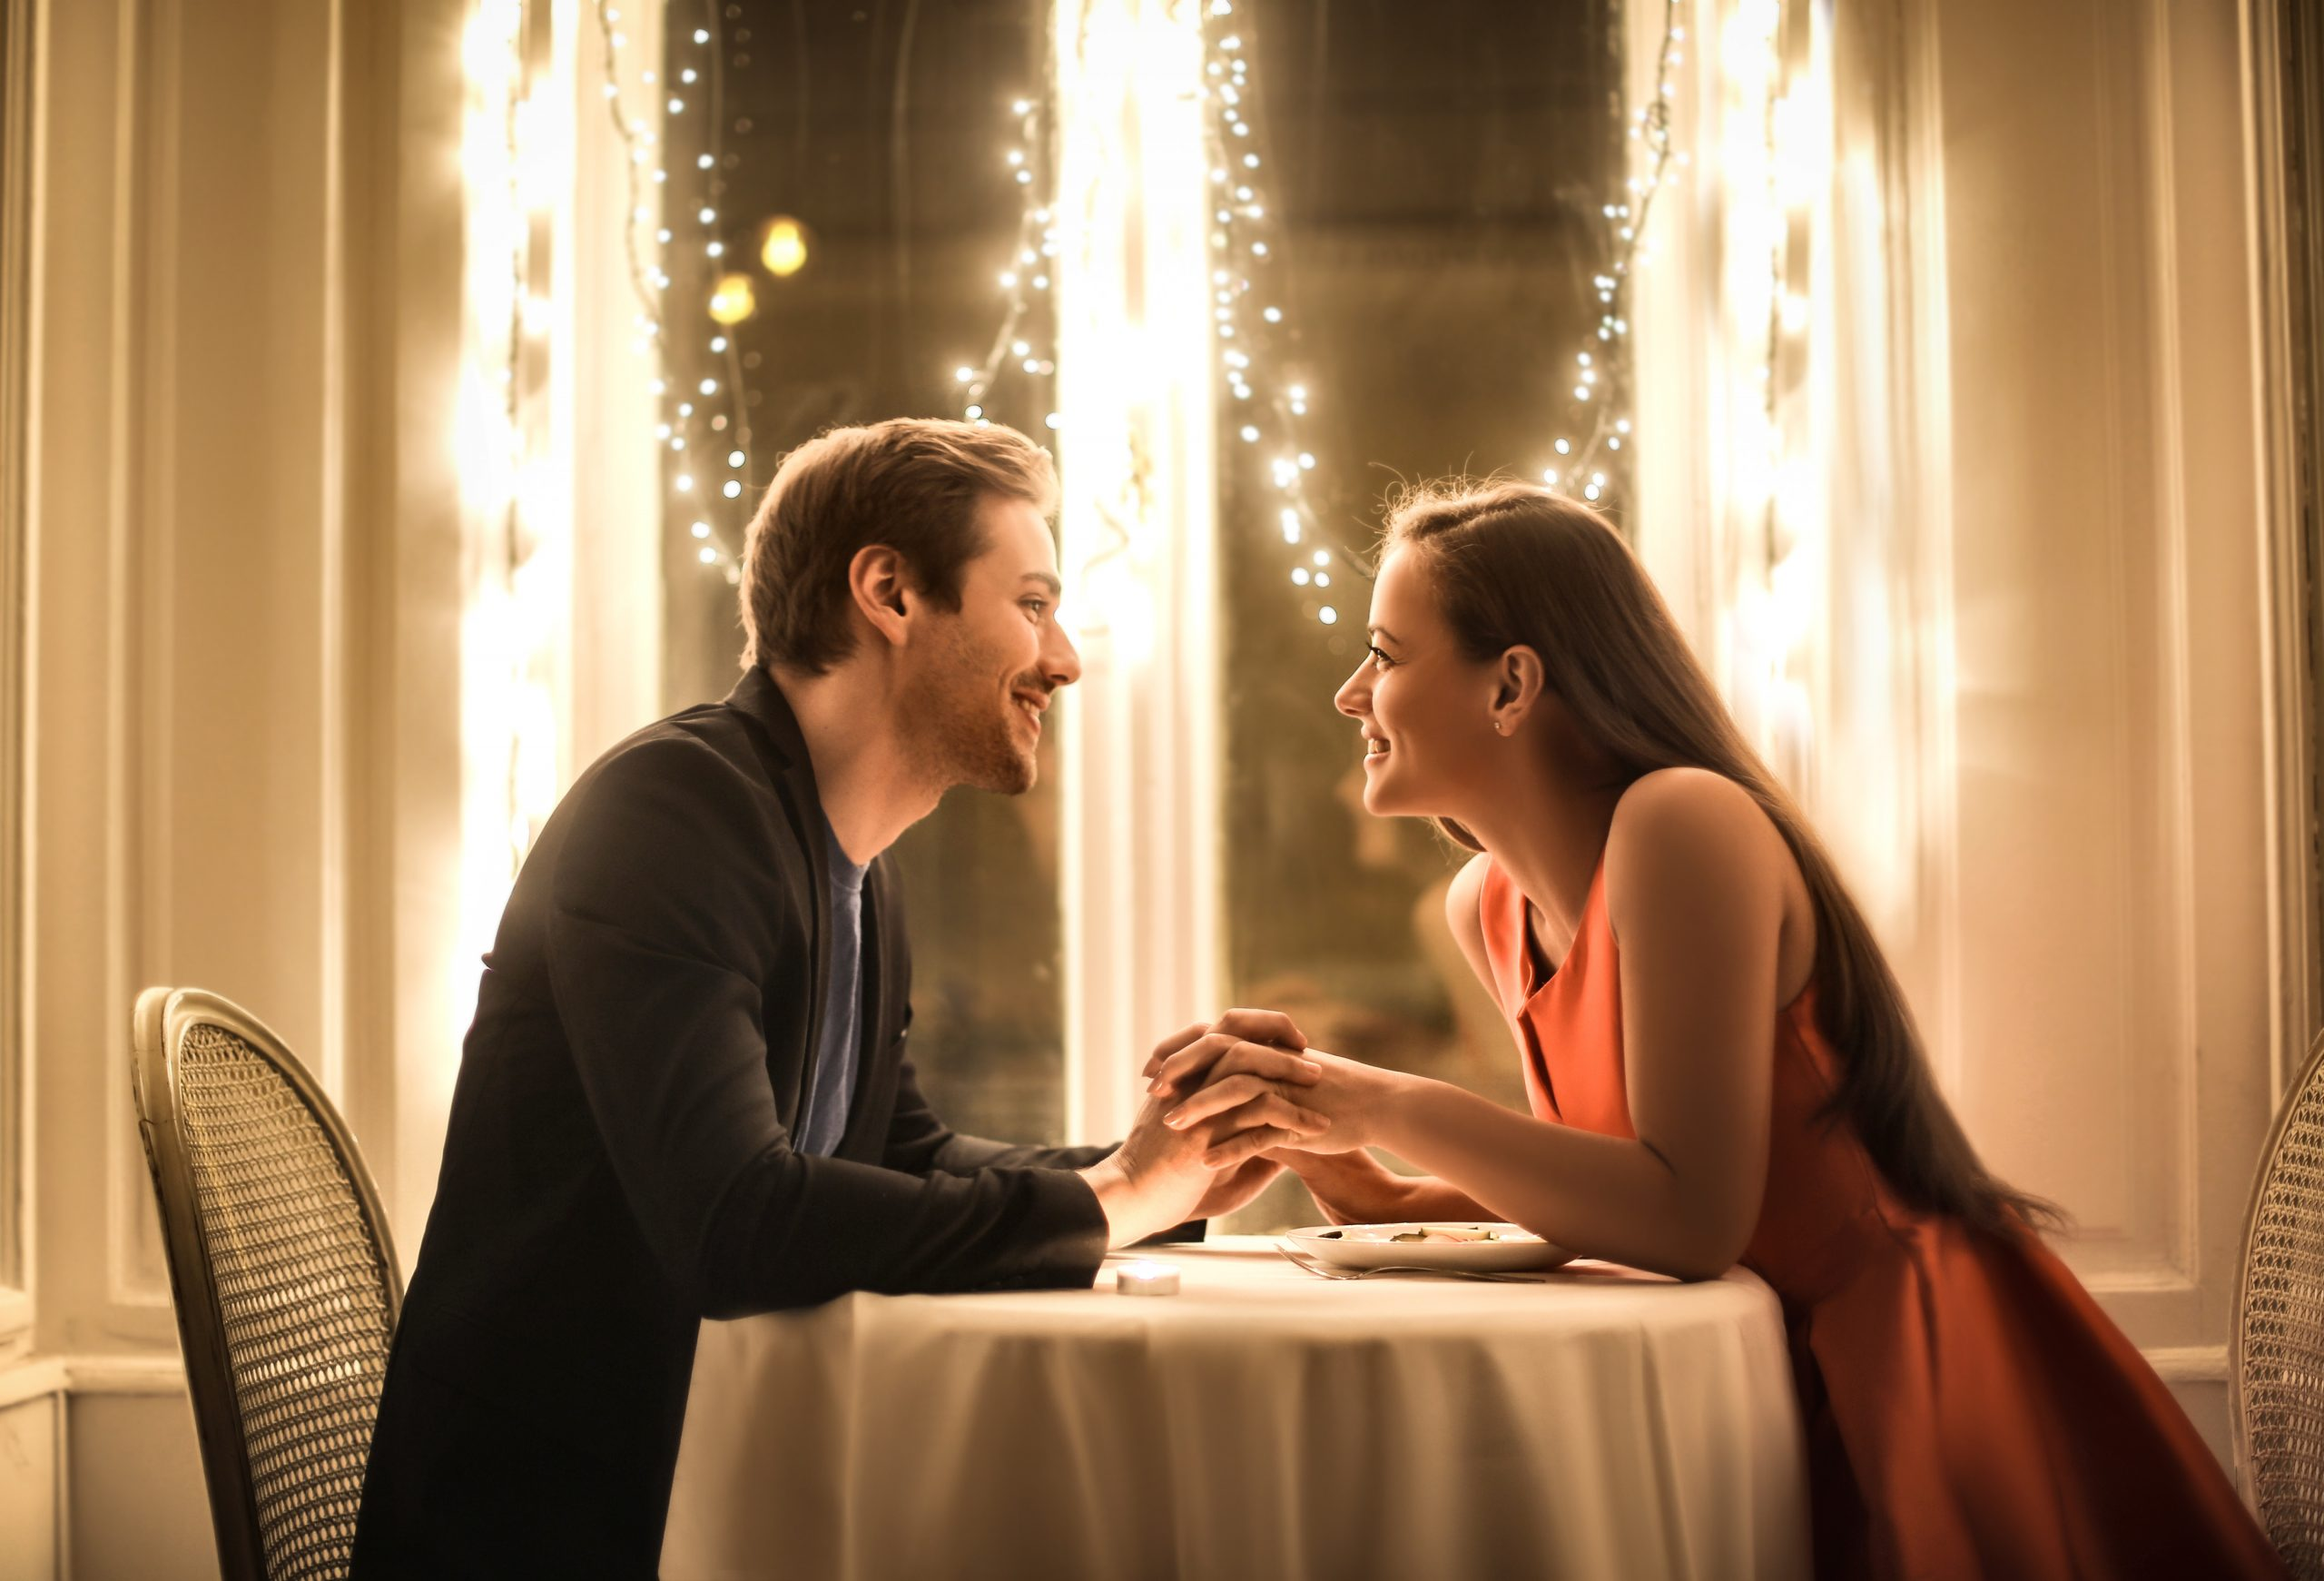 Sweet couple having a romantic dinner